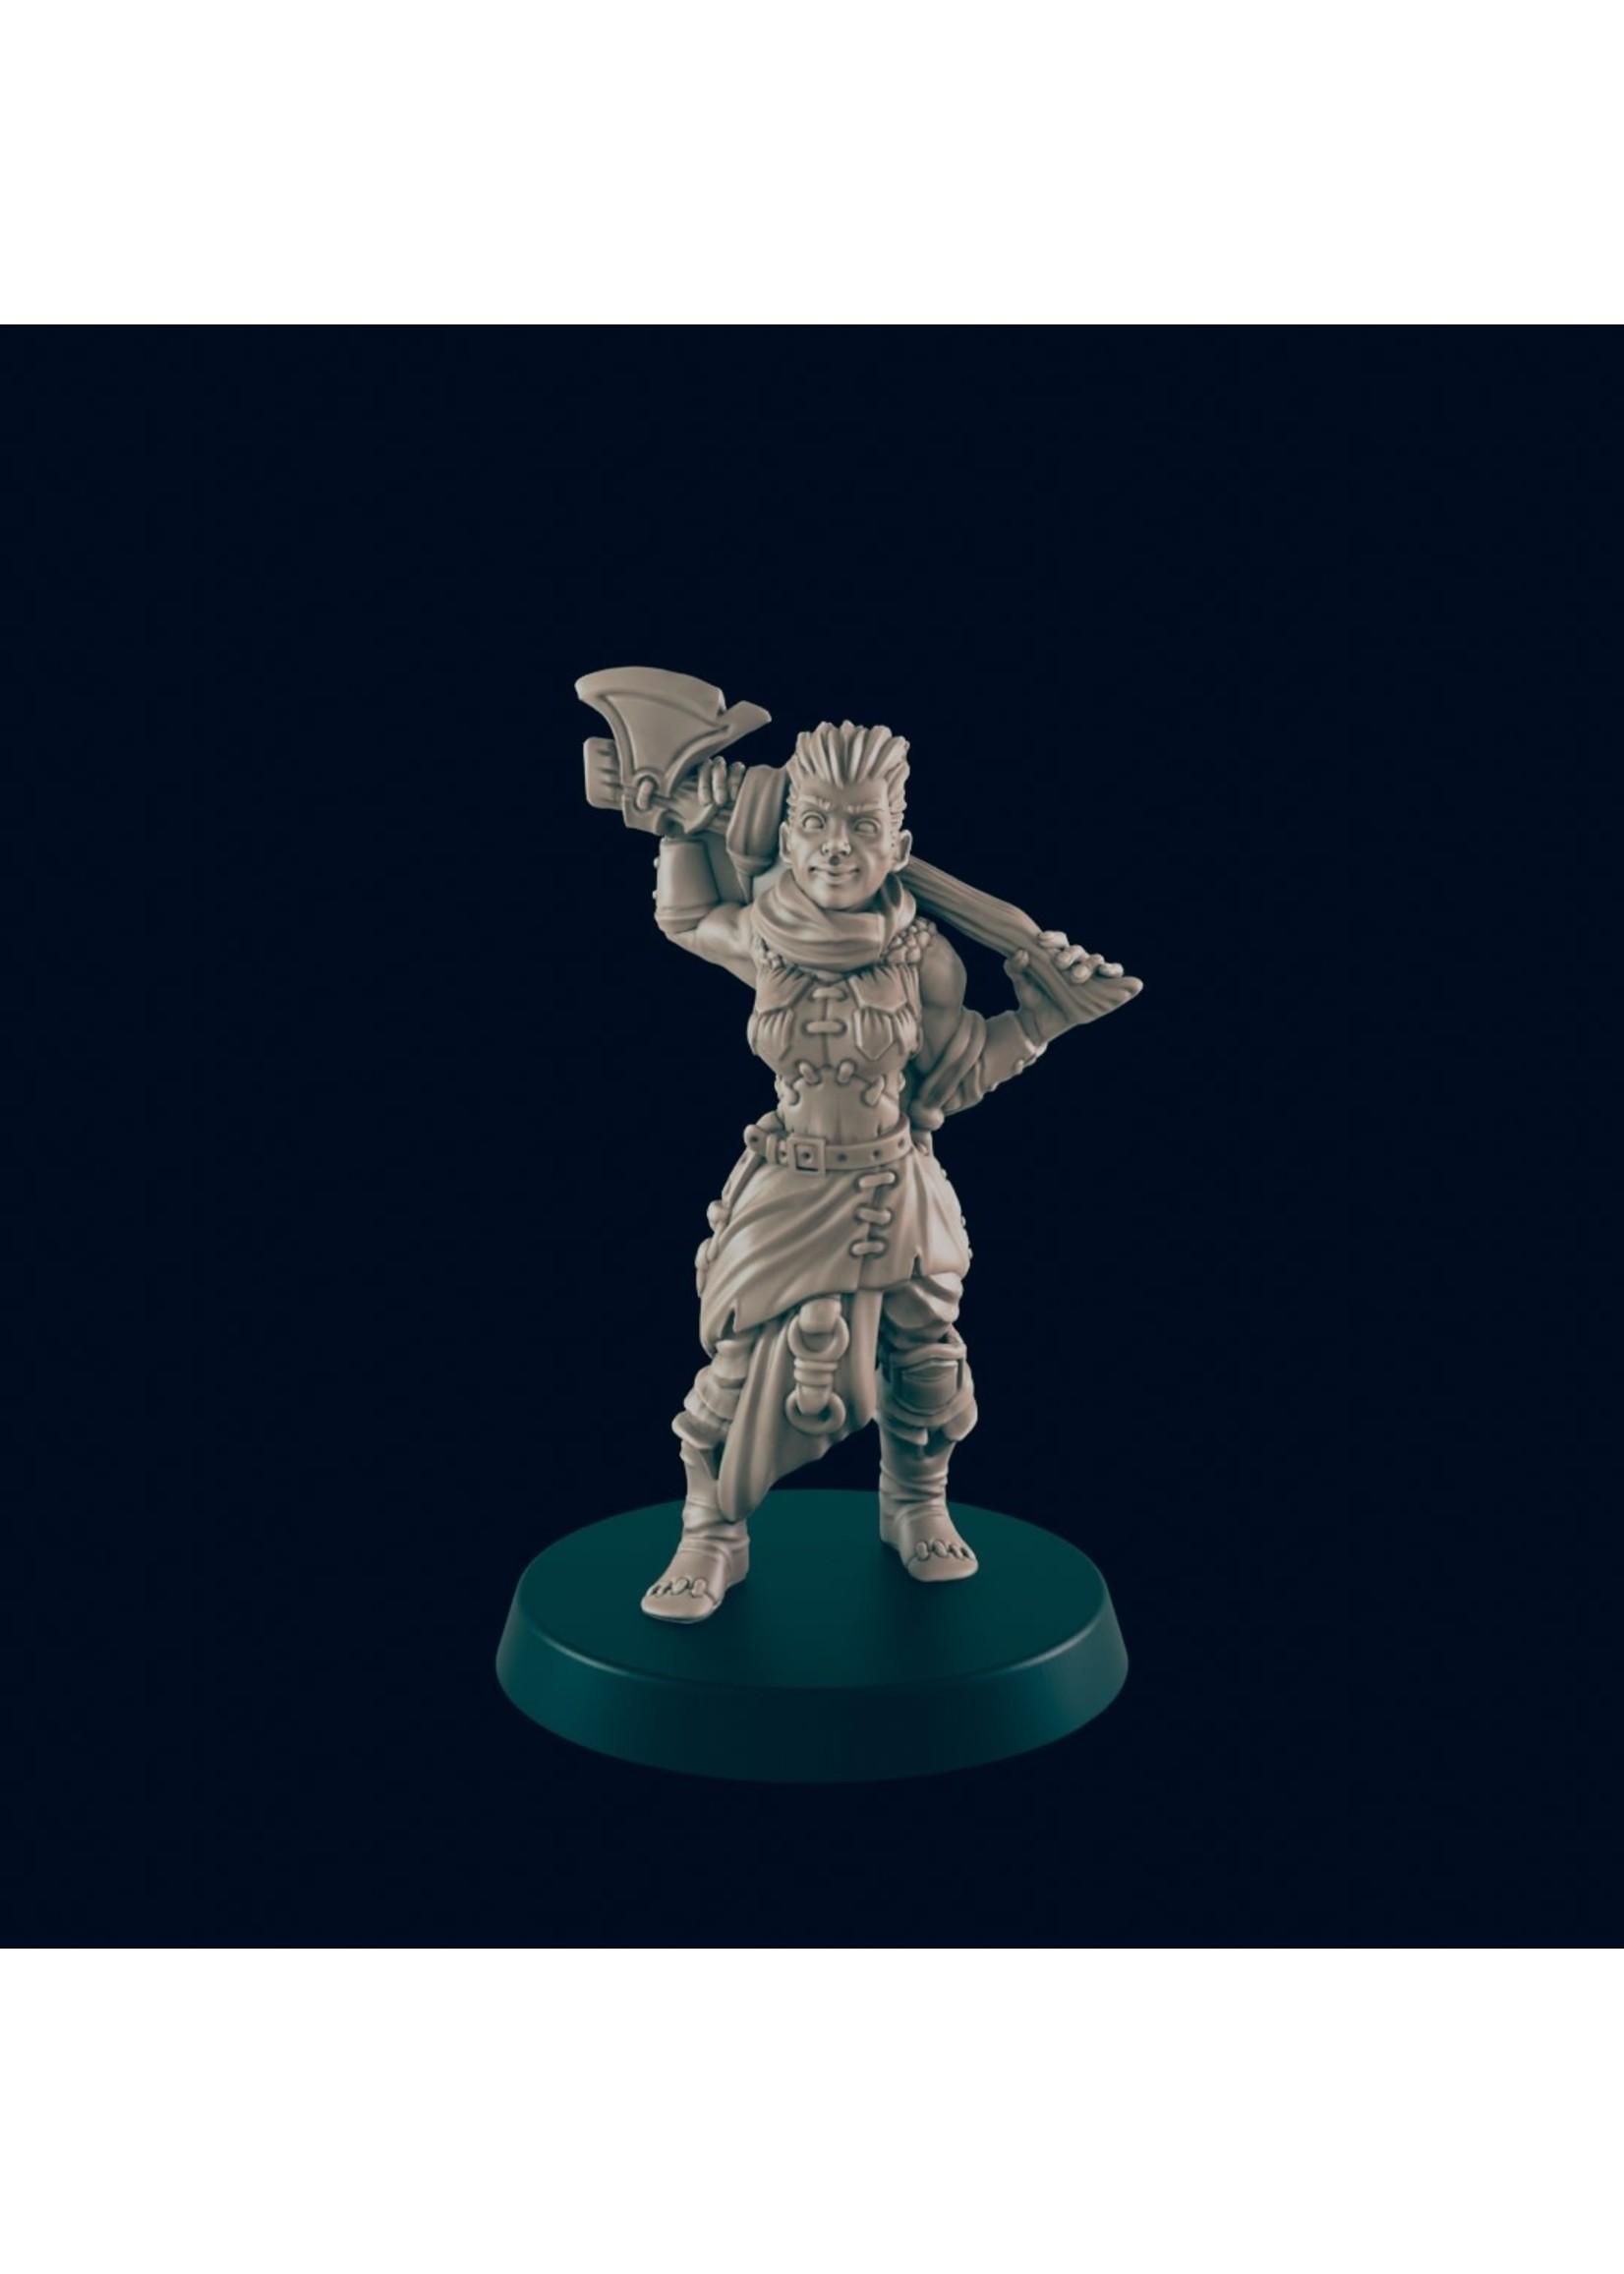 3D Printed Miniature - Half Orc Bandit - Dungeons & Dragons - Beasts and Baddies KS